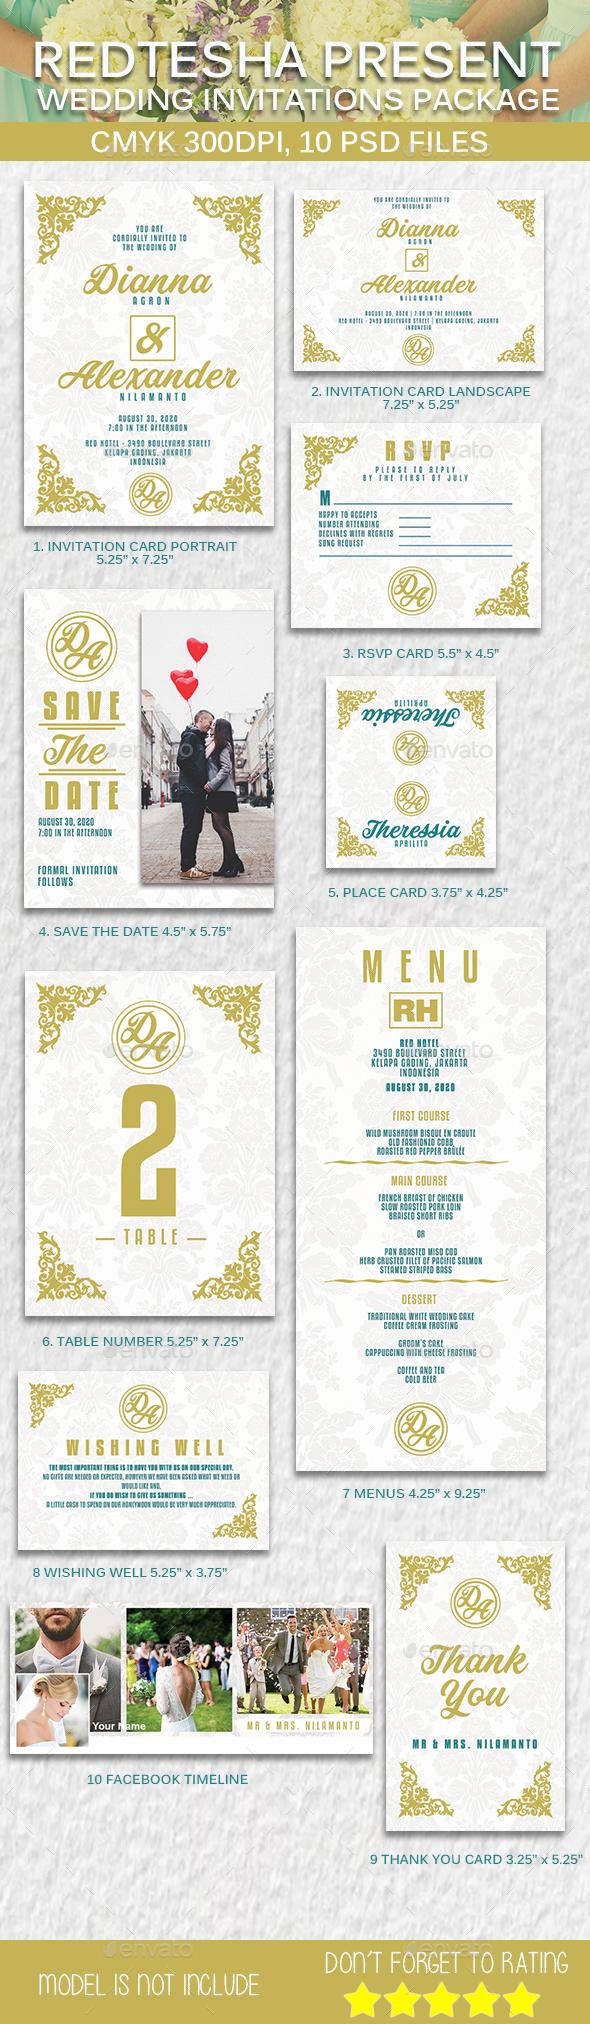 Wedding Invitation Package - Weddings Cards & Invites